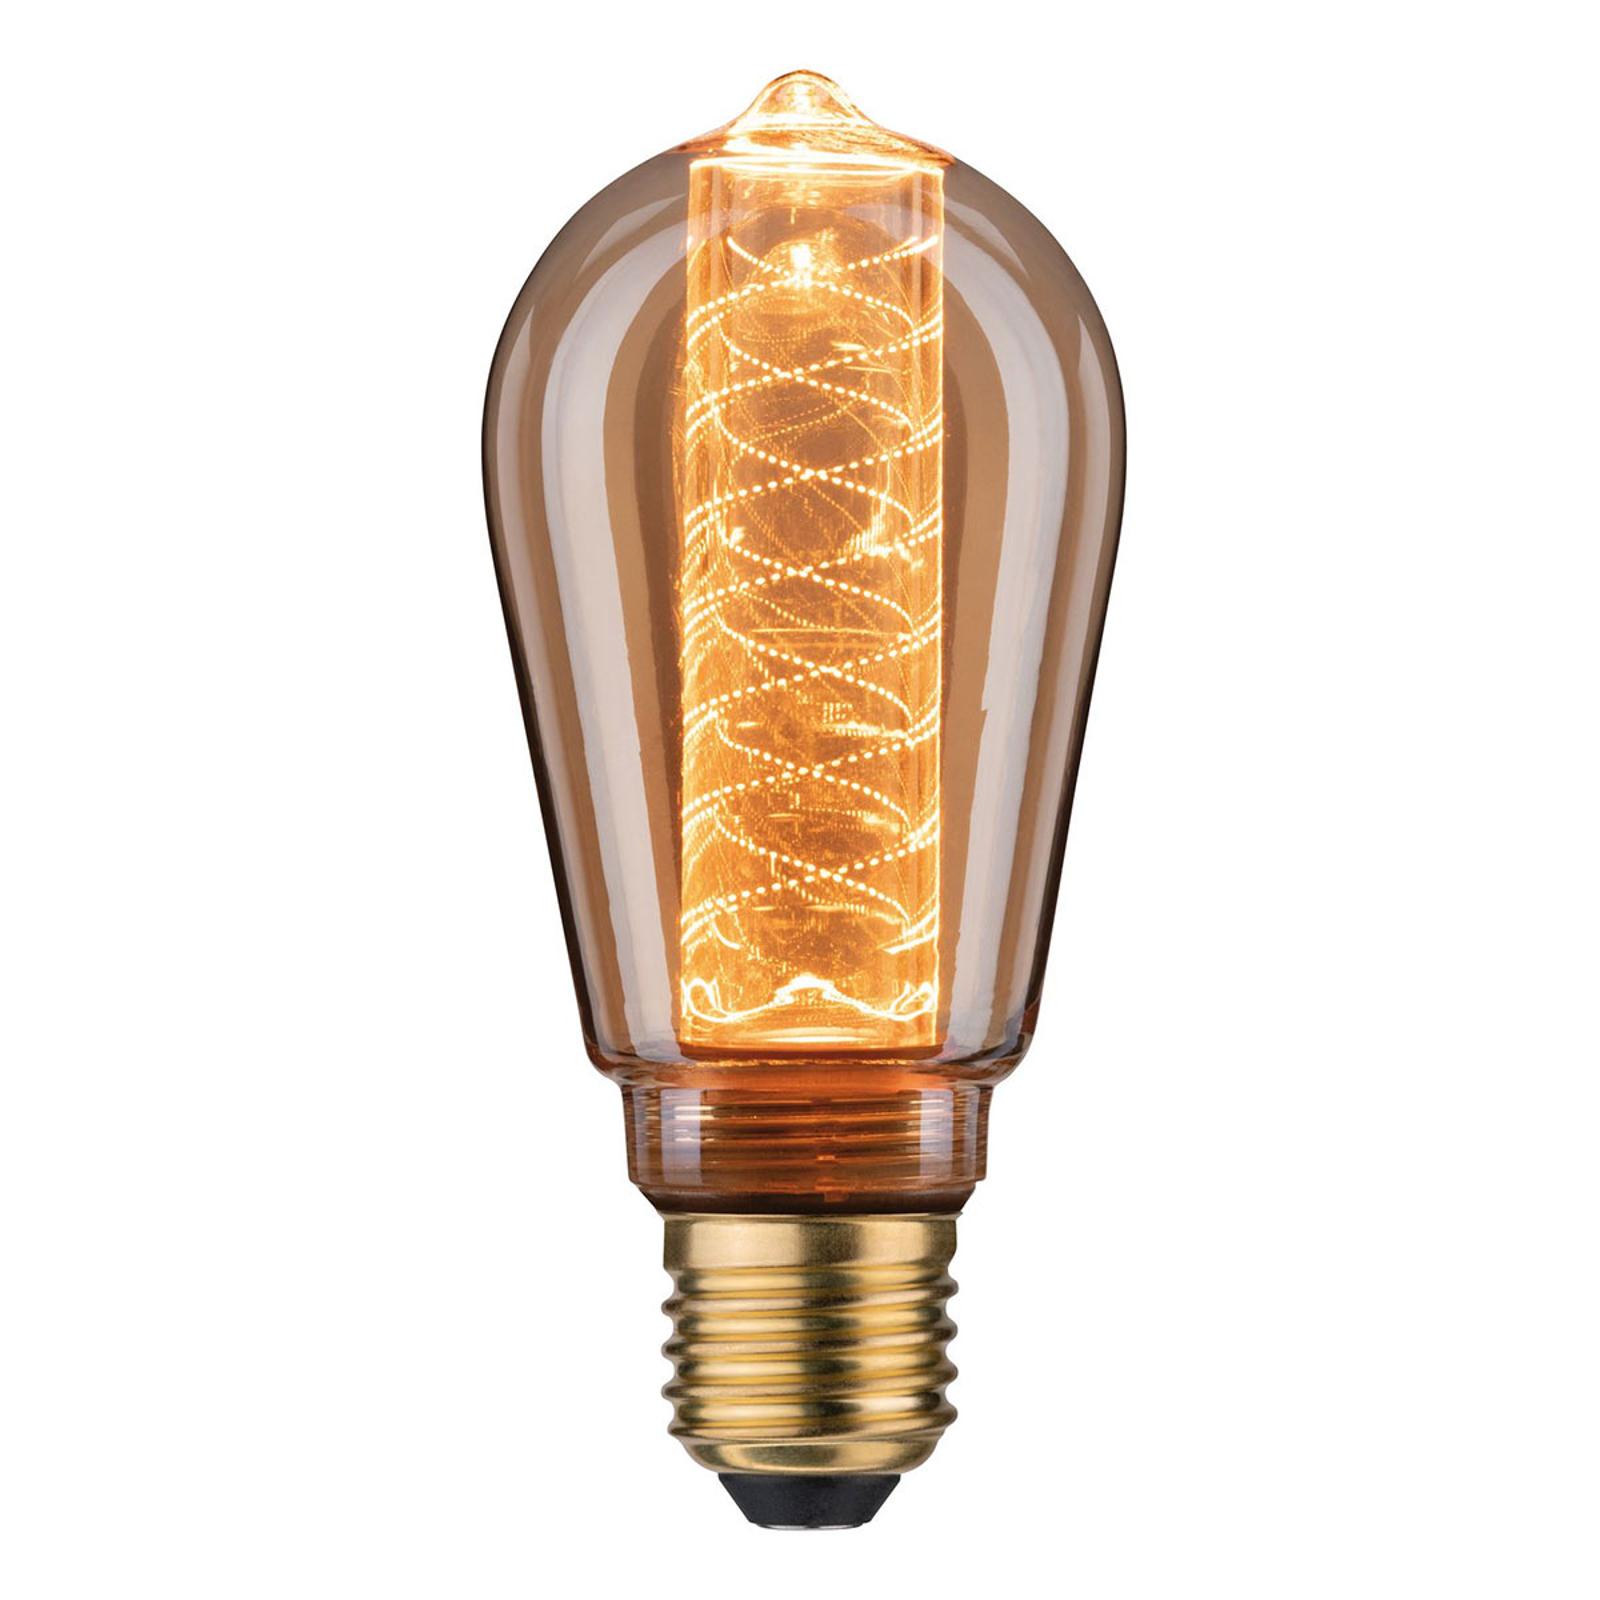 LED-pære E27 ST64 4 W InnerGlow spiralmønster